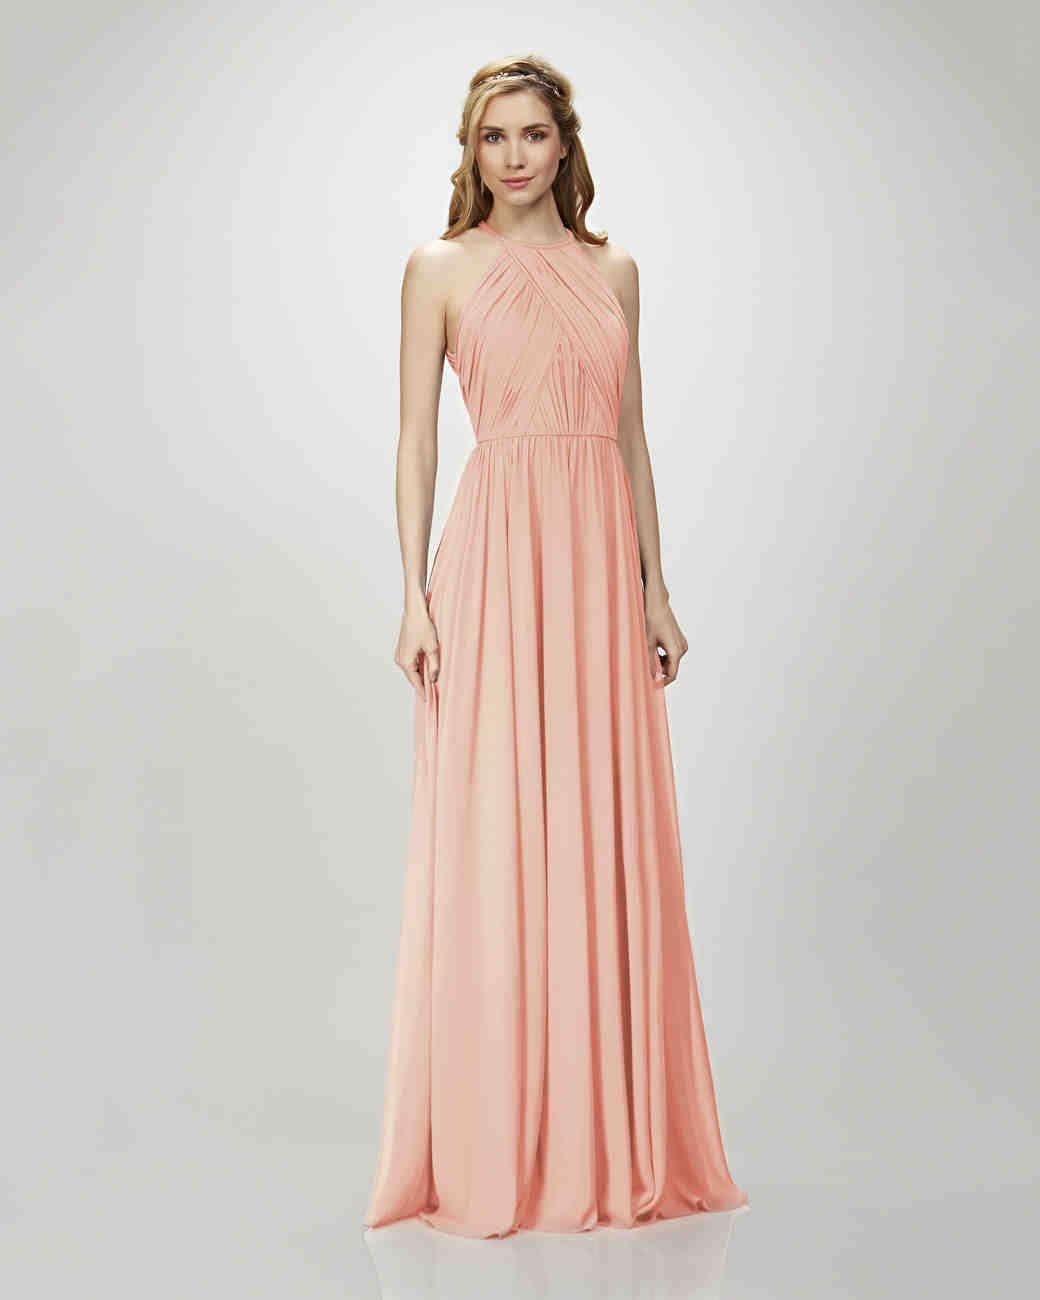 Coral bridesmaid dresses martha stewart weddings ombrellifo Gallery